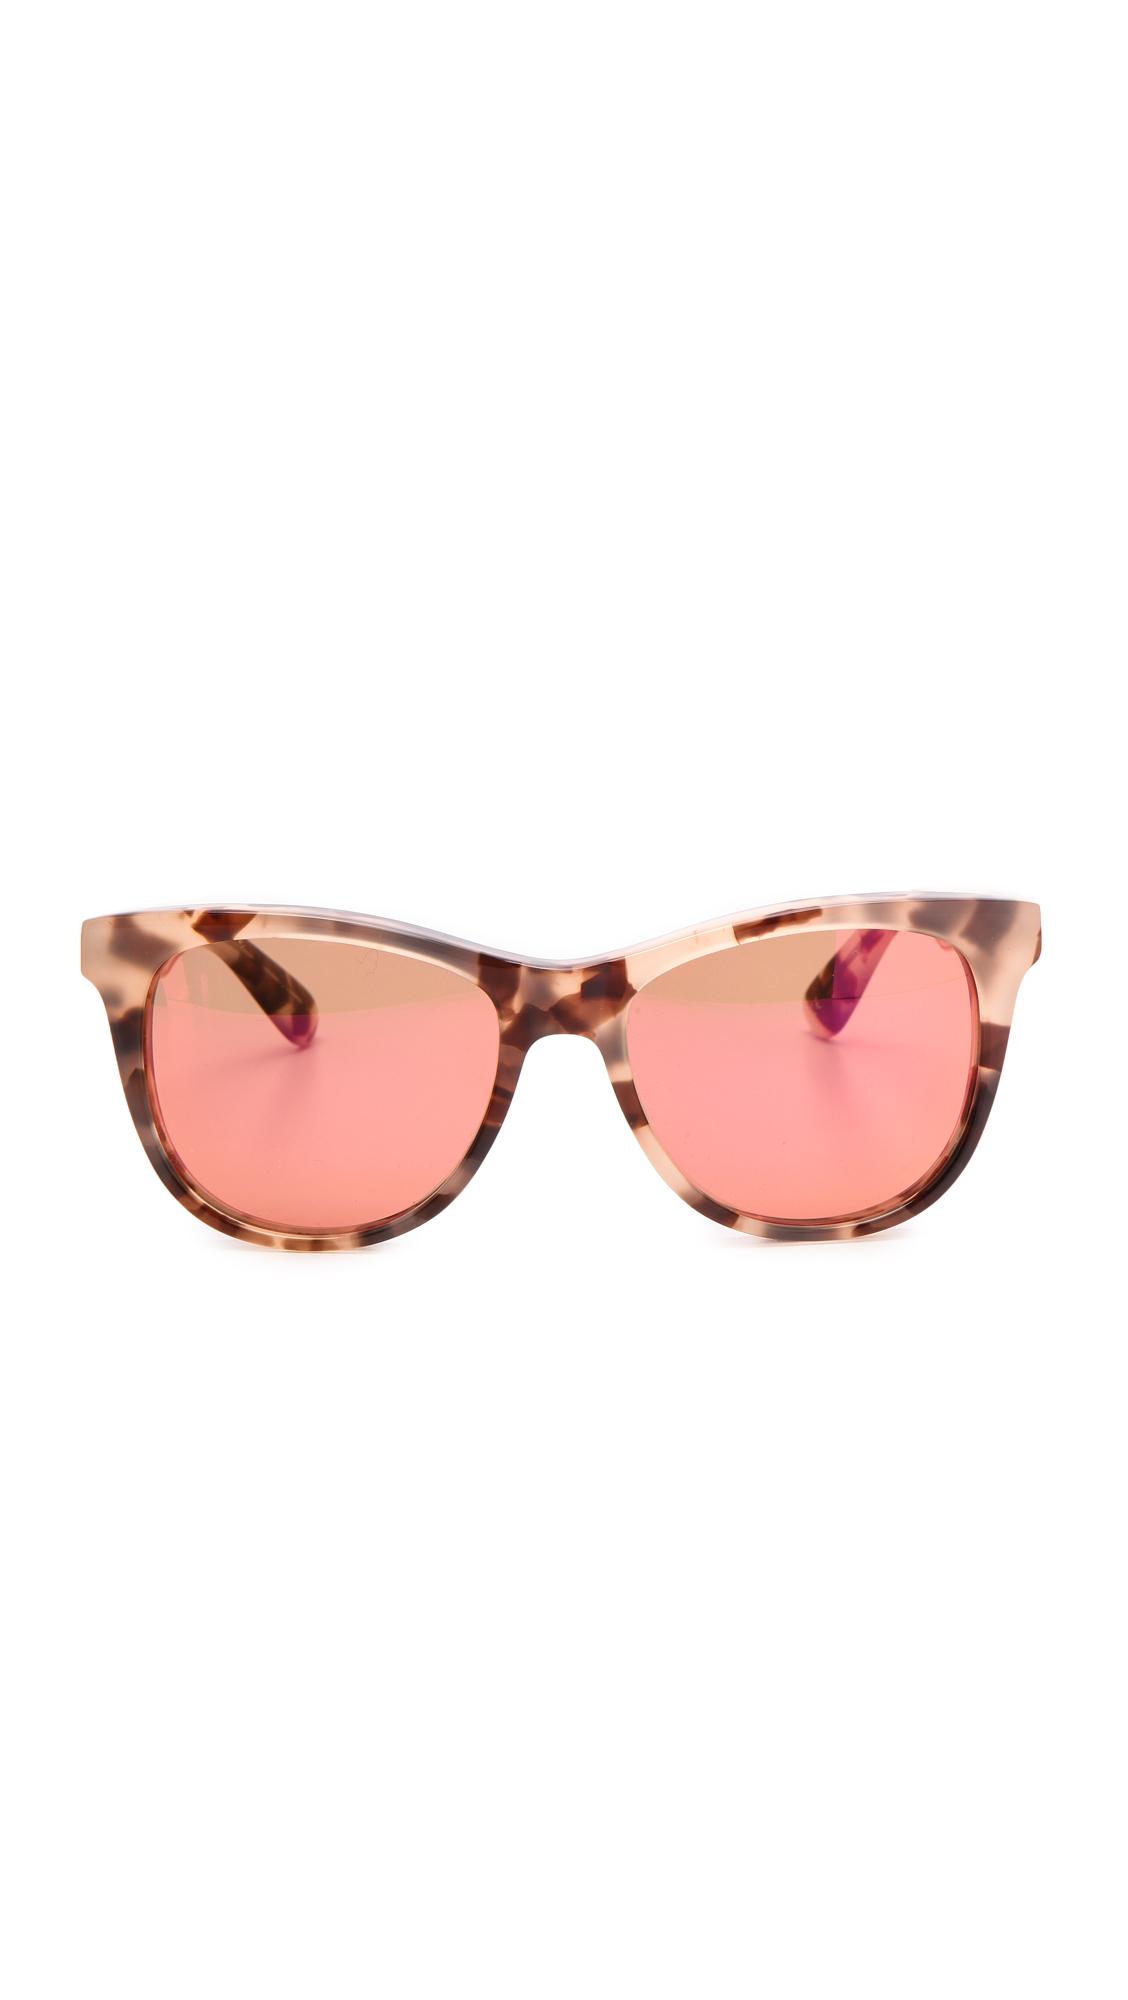 Sunglasses - Wildfox